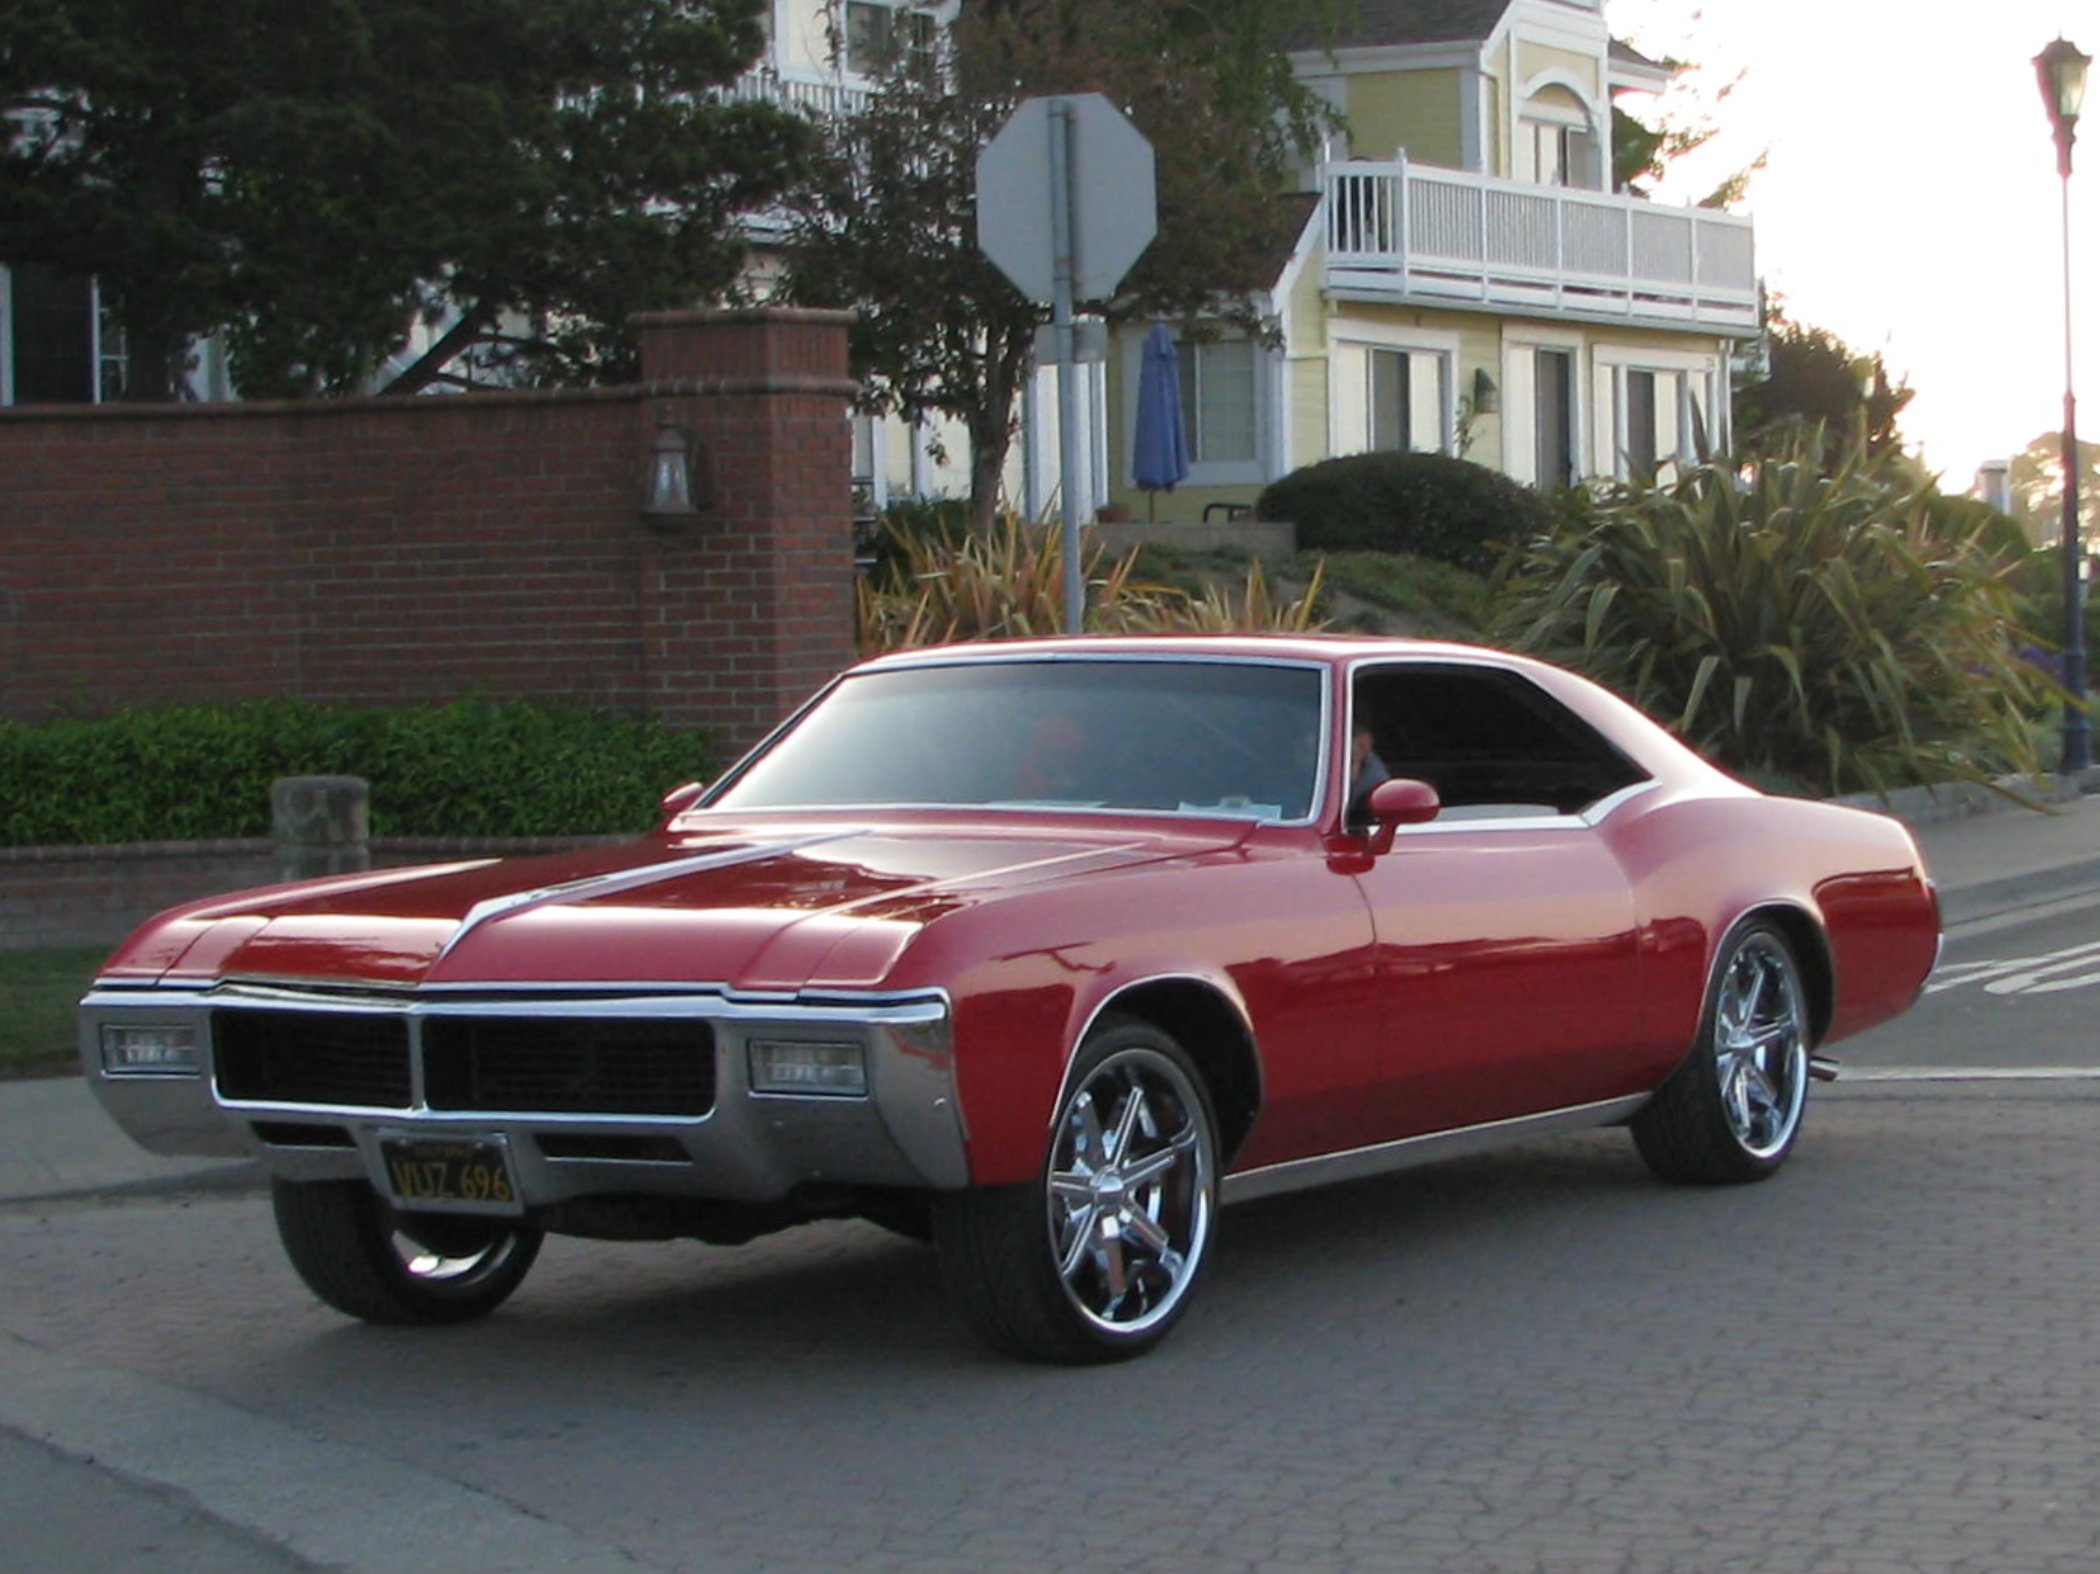 1968 buick electra 225 2 door hardtop front 3 4 81136 - Filename 3589731447_473b5f24bb_o Jpg